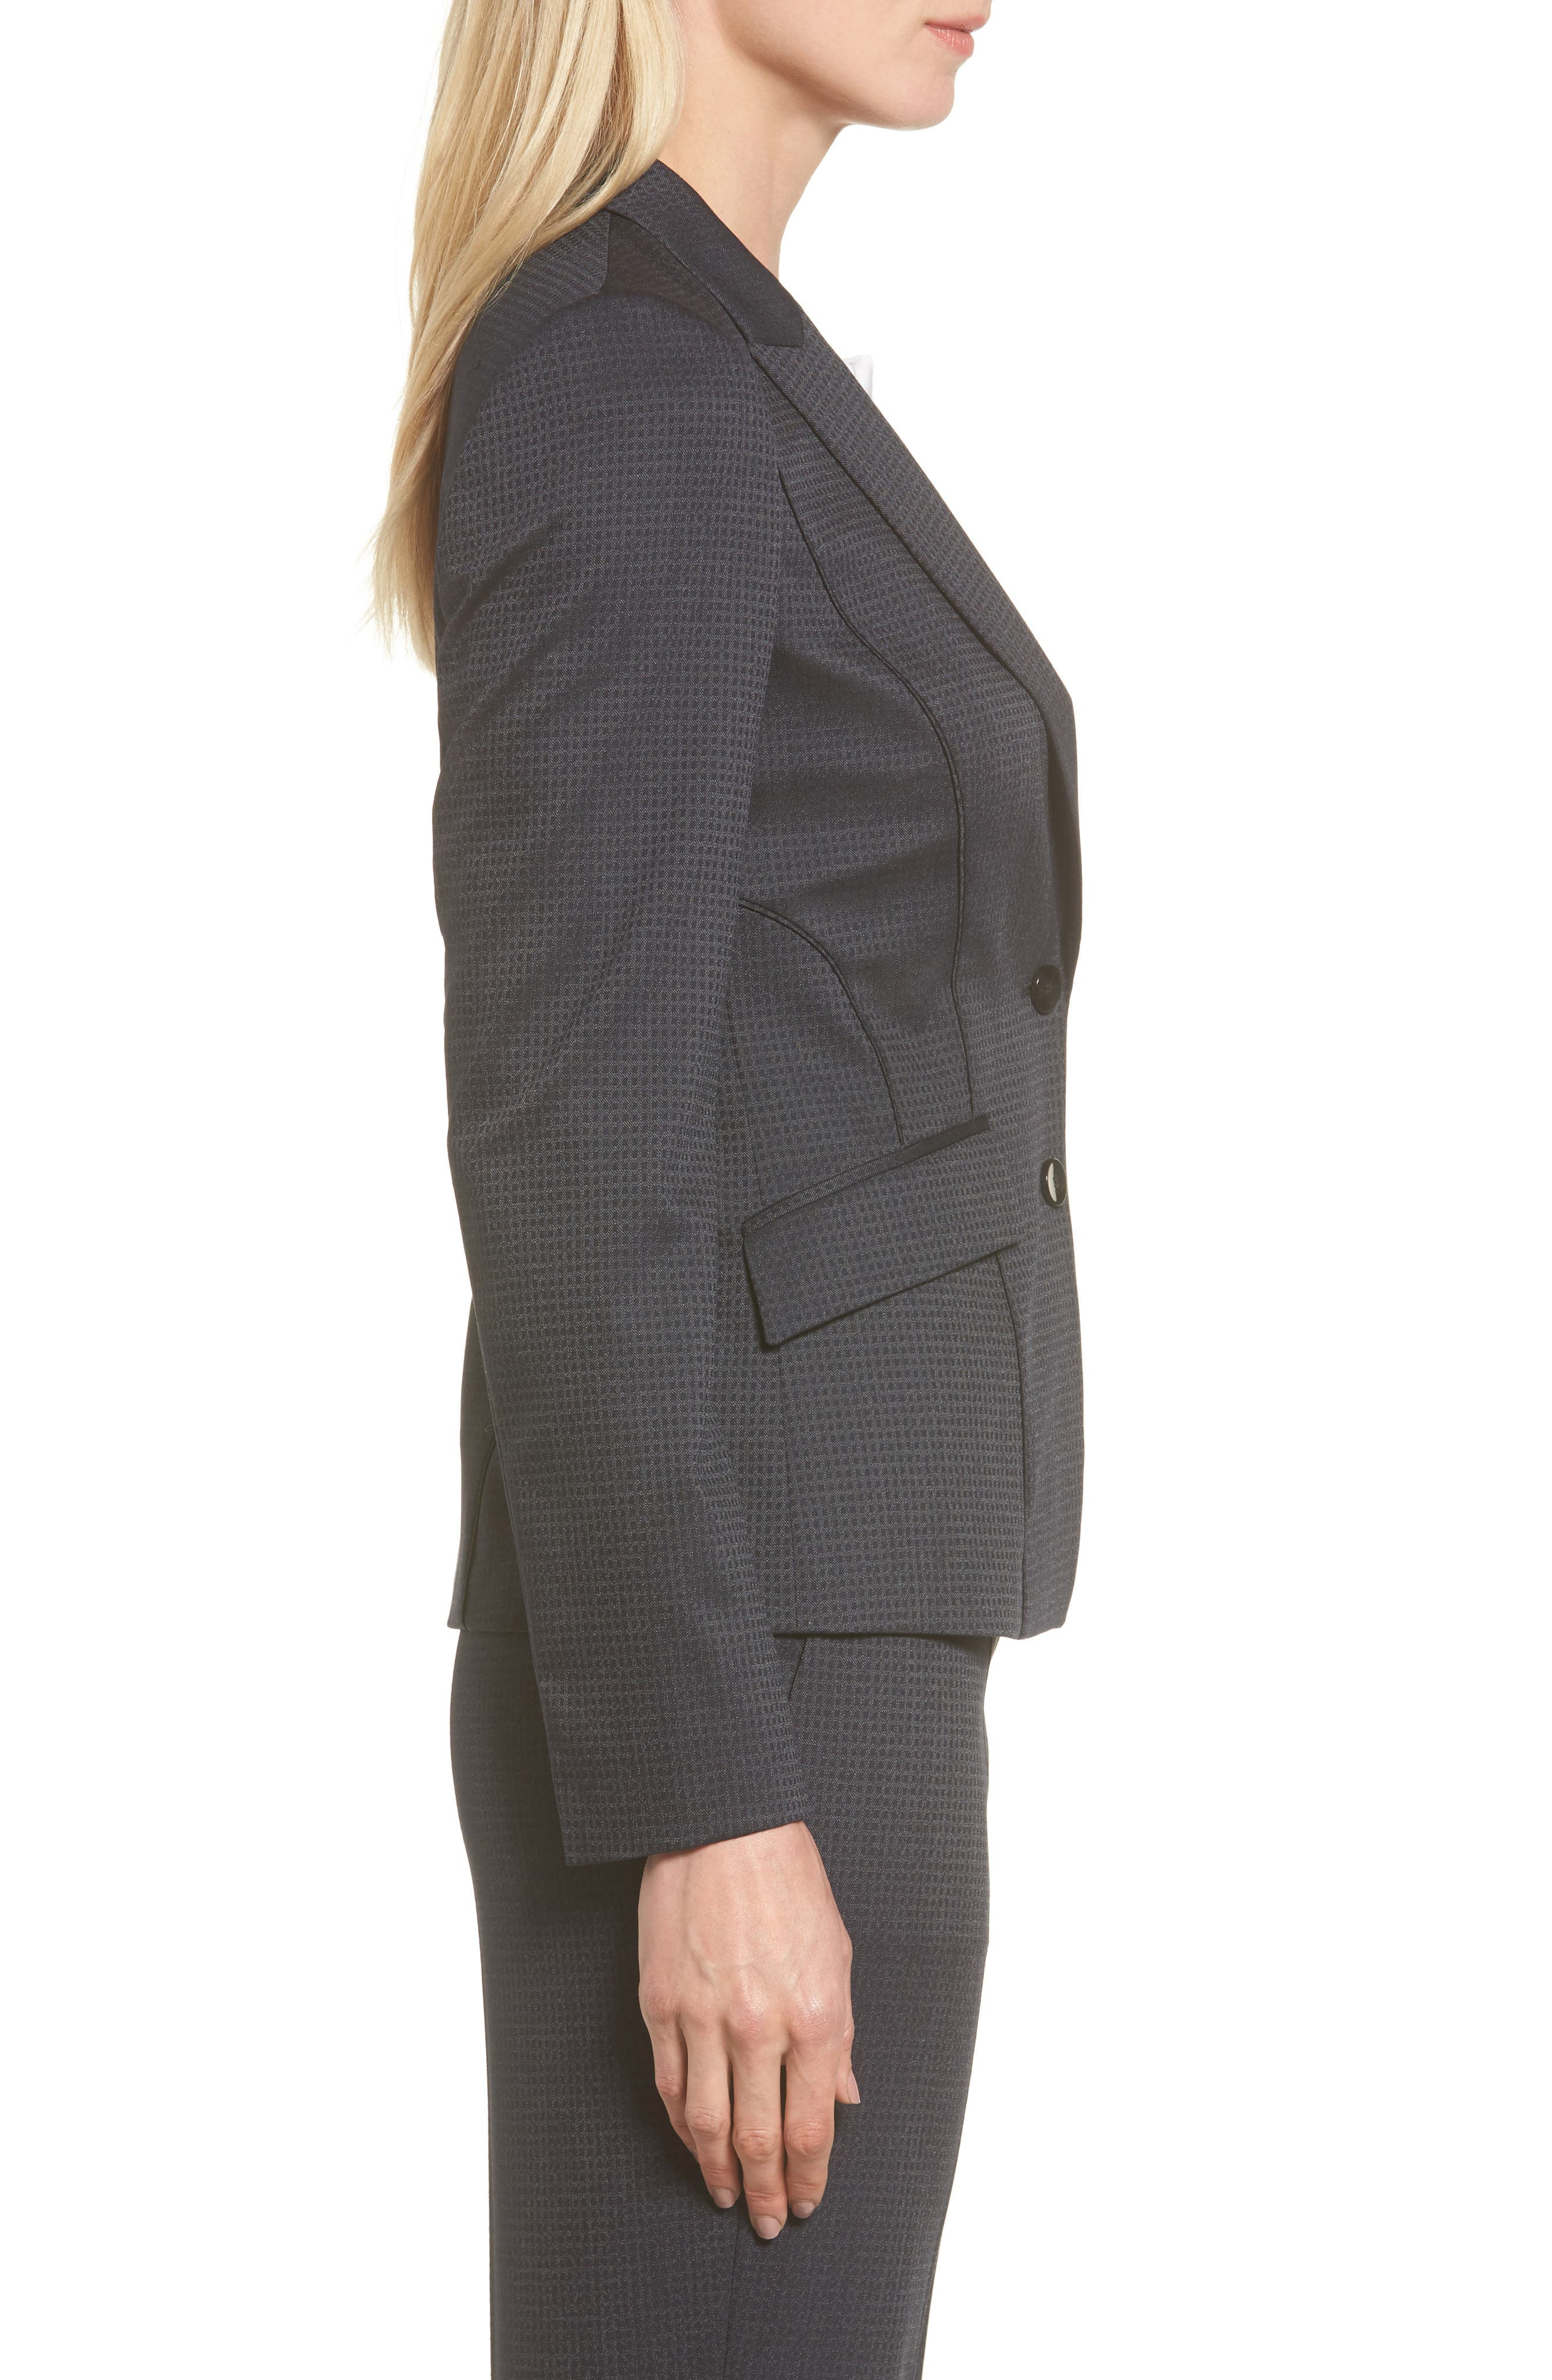 Jukani Check Wool Blend Suit Jacket,                             Alternate thumbnail 6, color,